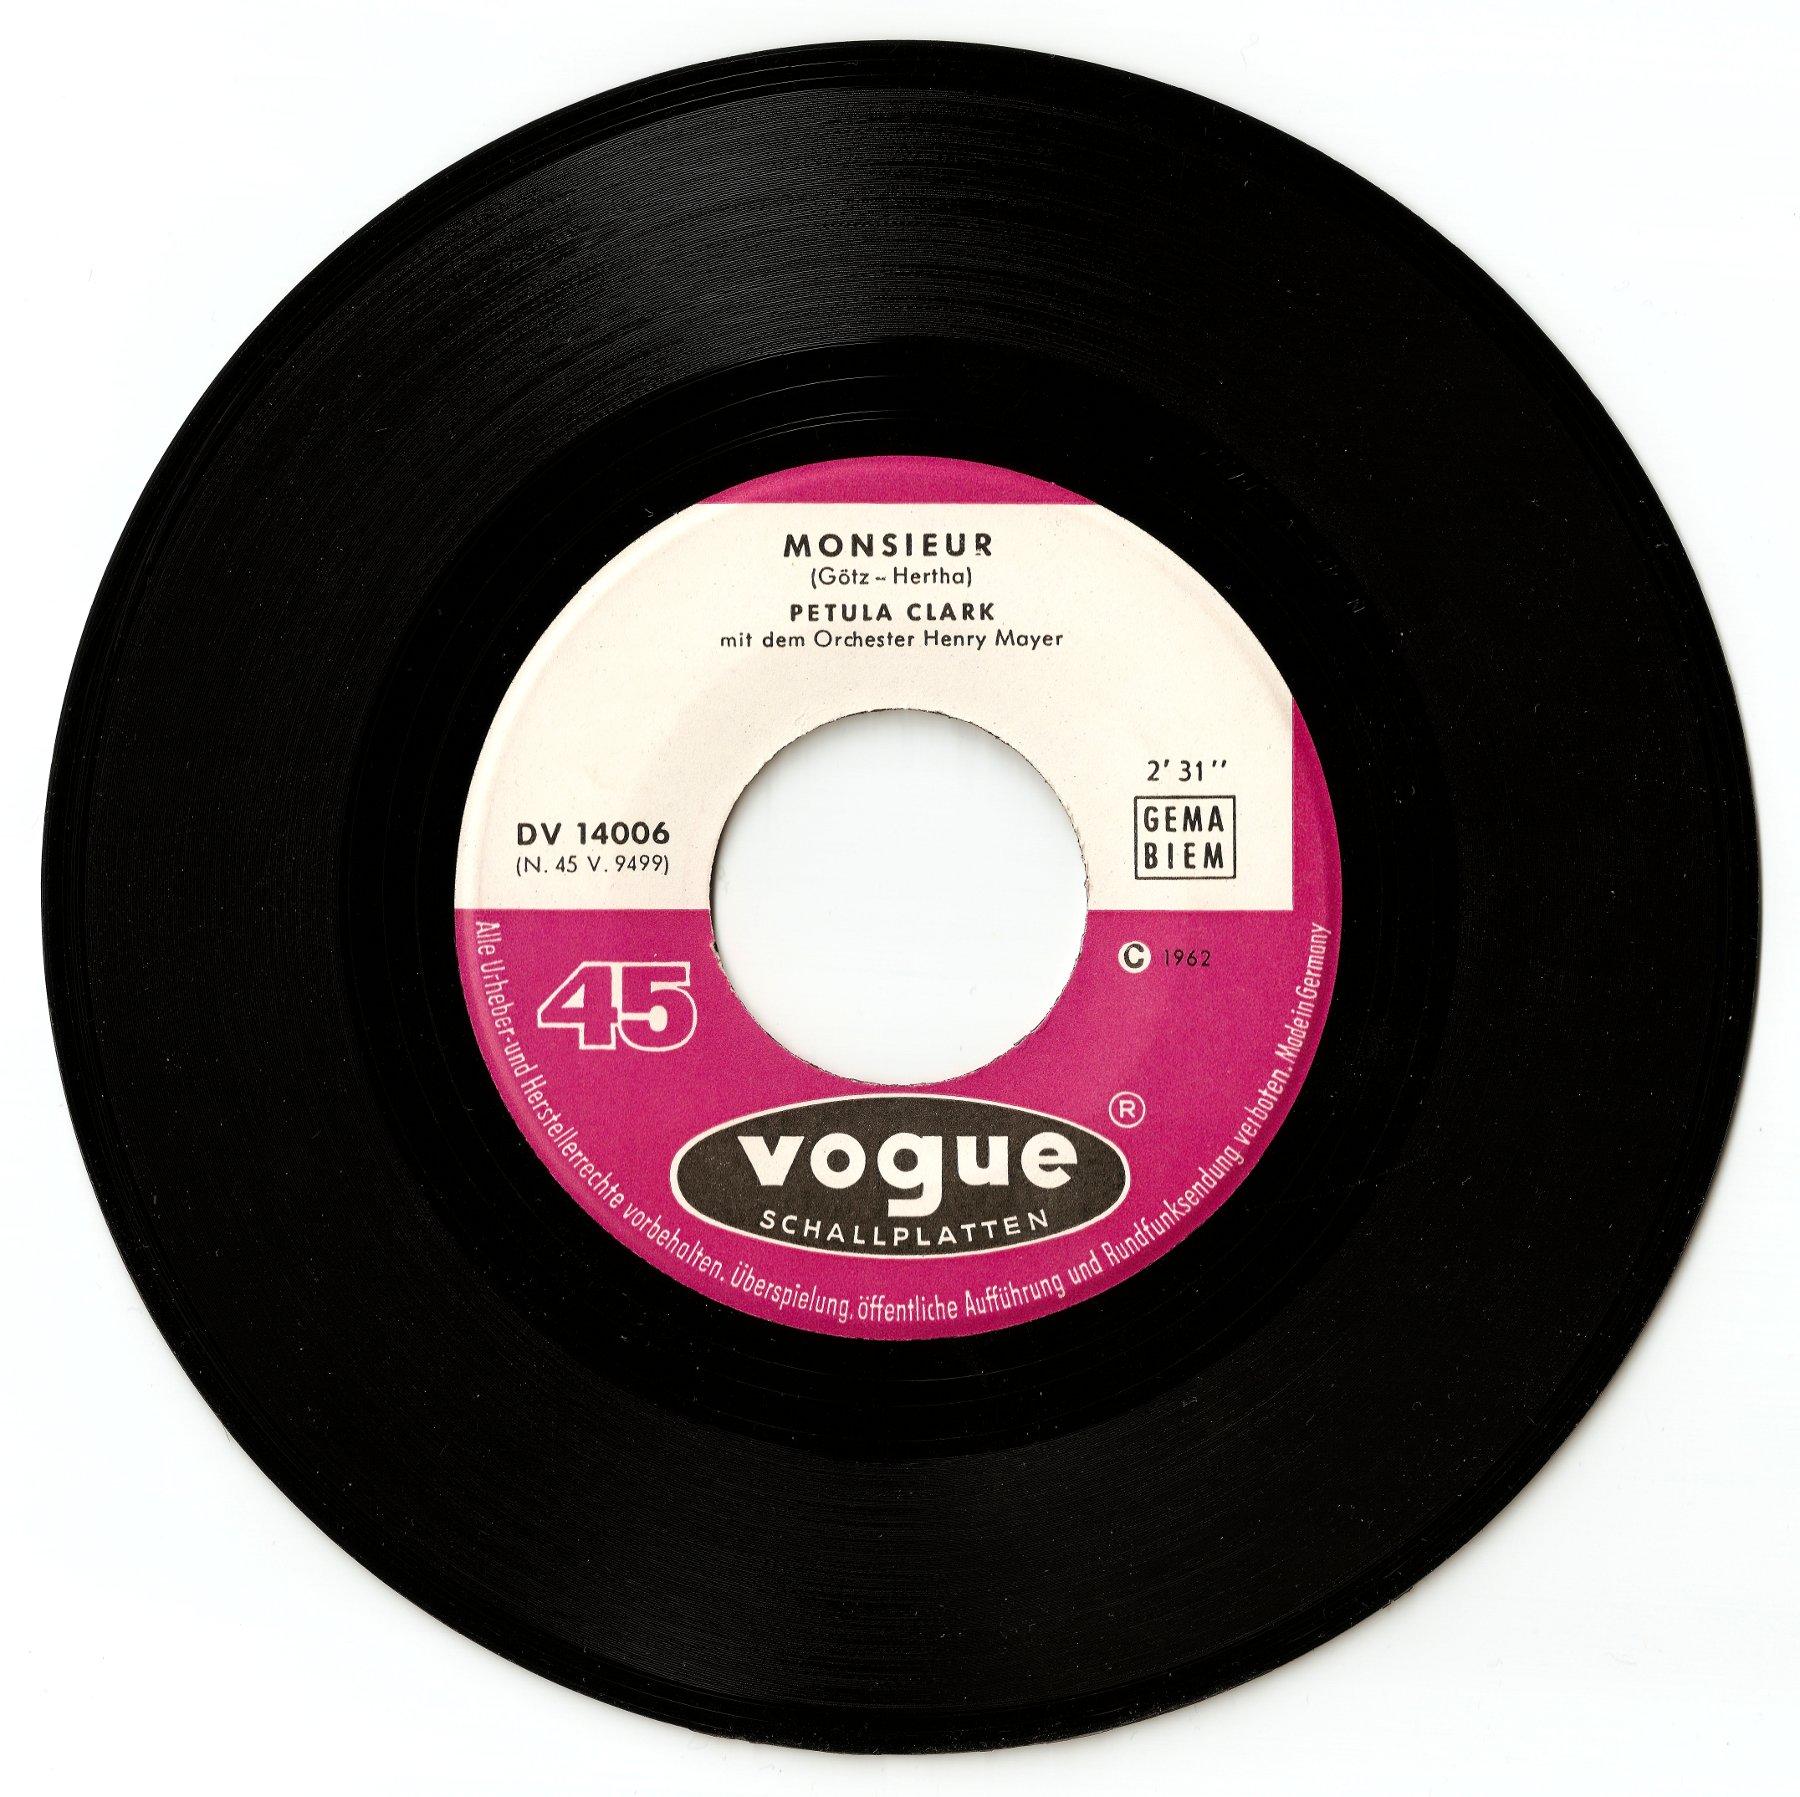 Vogue DV 14 006 Petula Clark.jpg